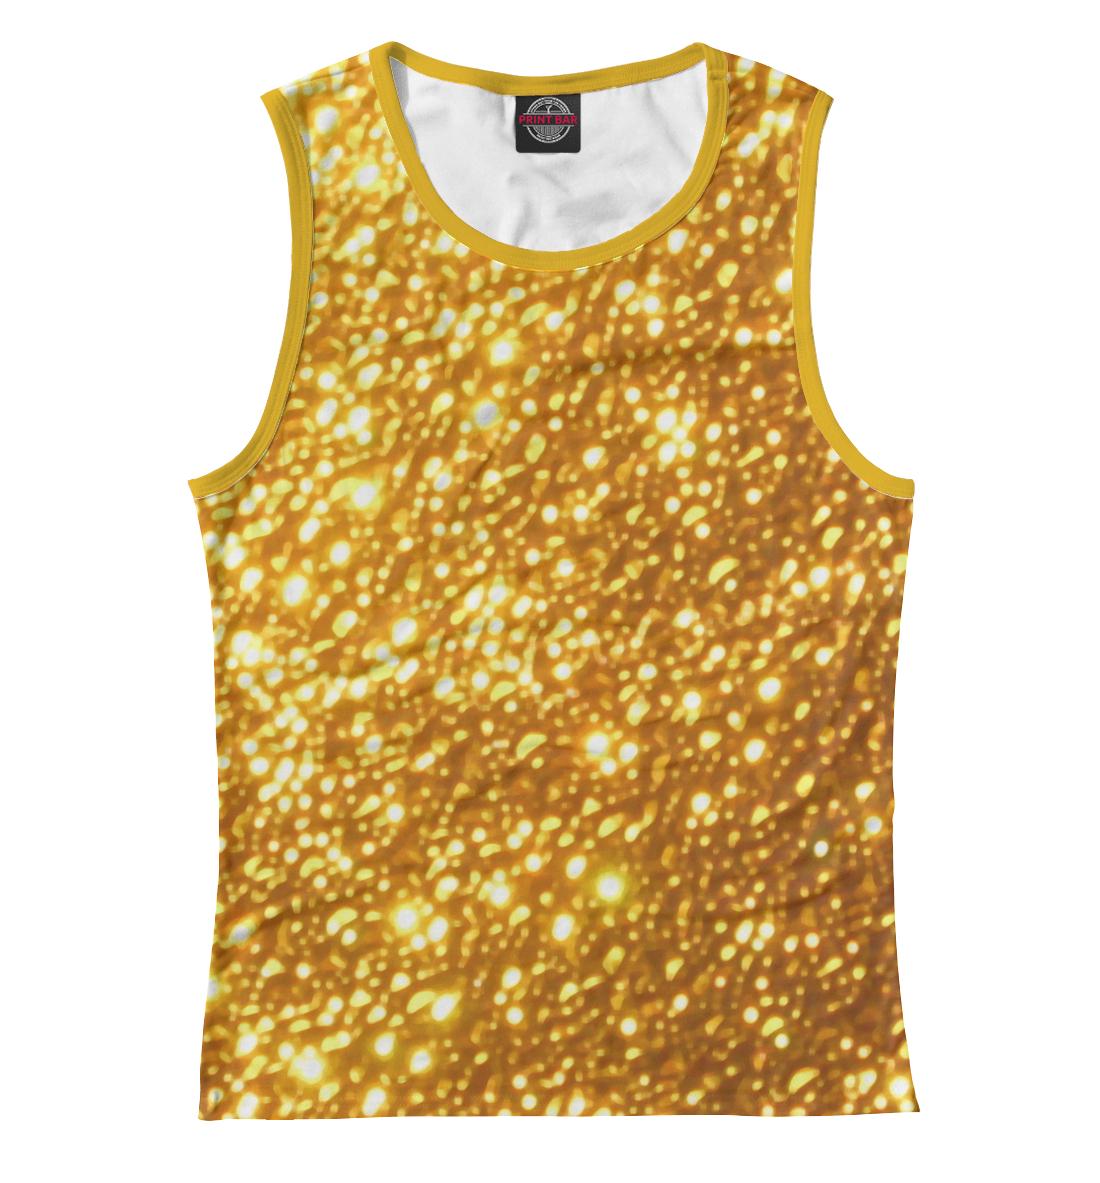 Купить Золото, Printbar, Майки, APD-995625-may-1